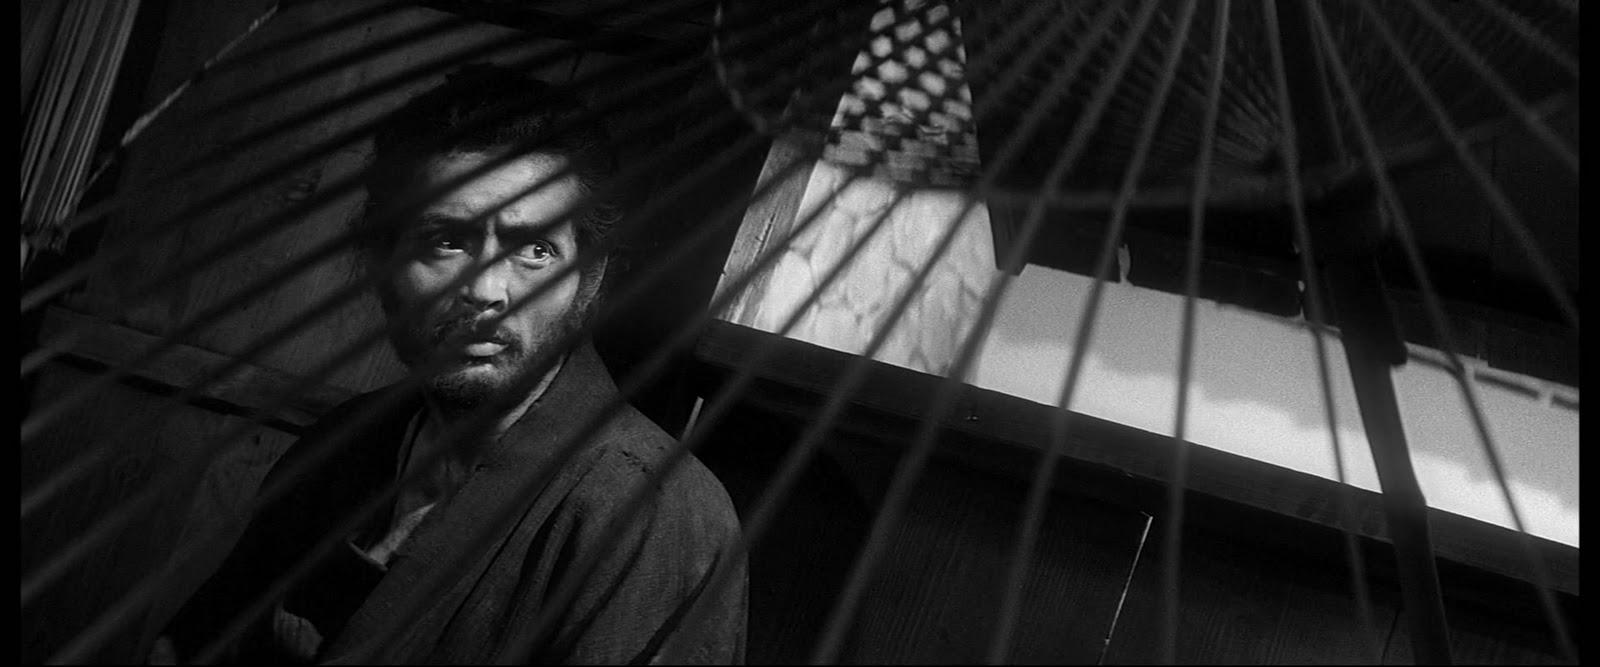 Harakiri (1962) | bonjourtristesse.net